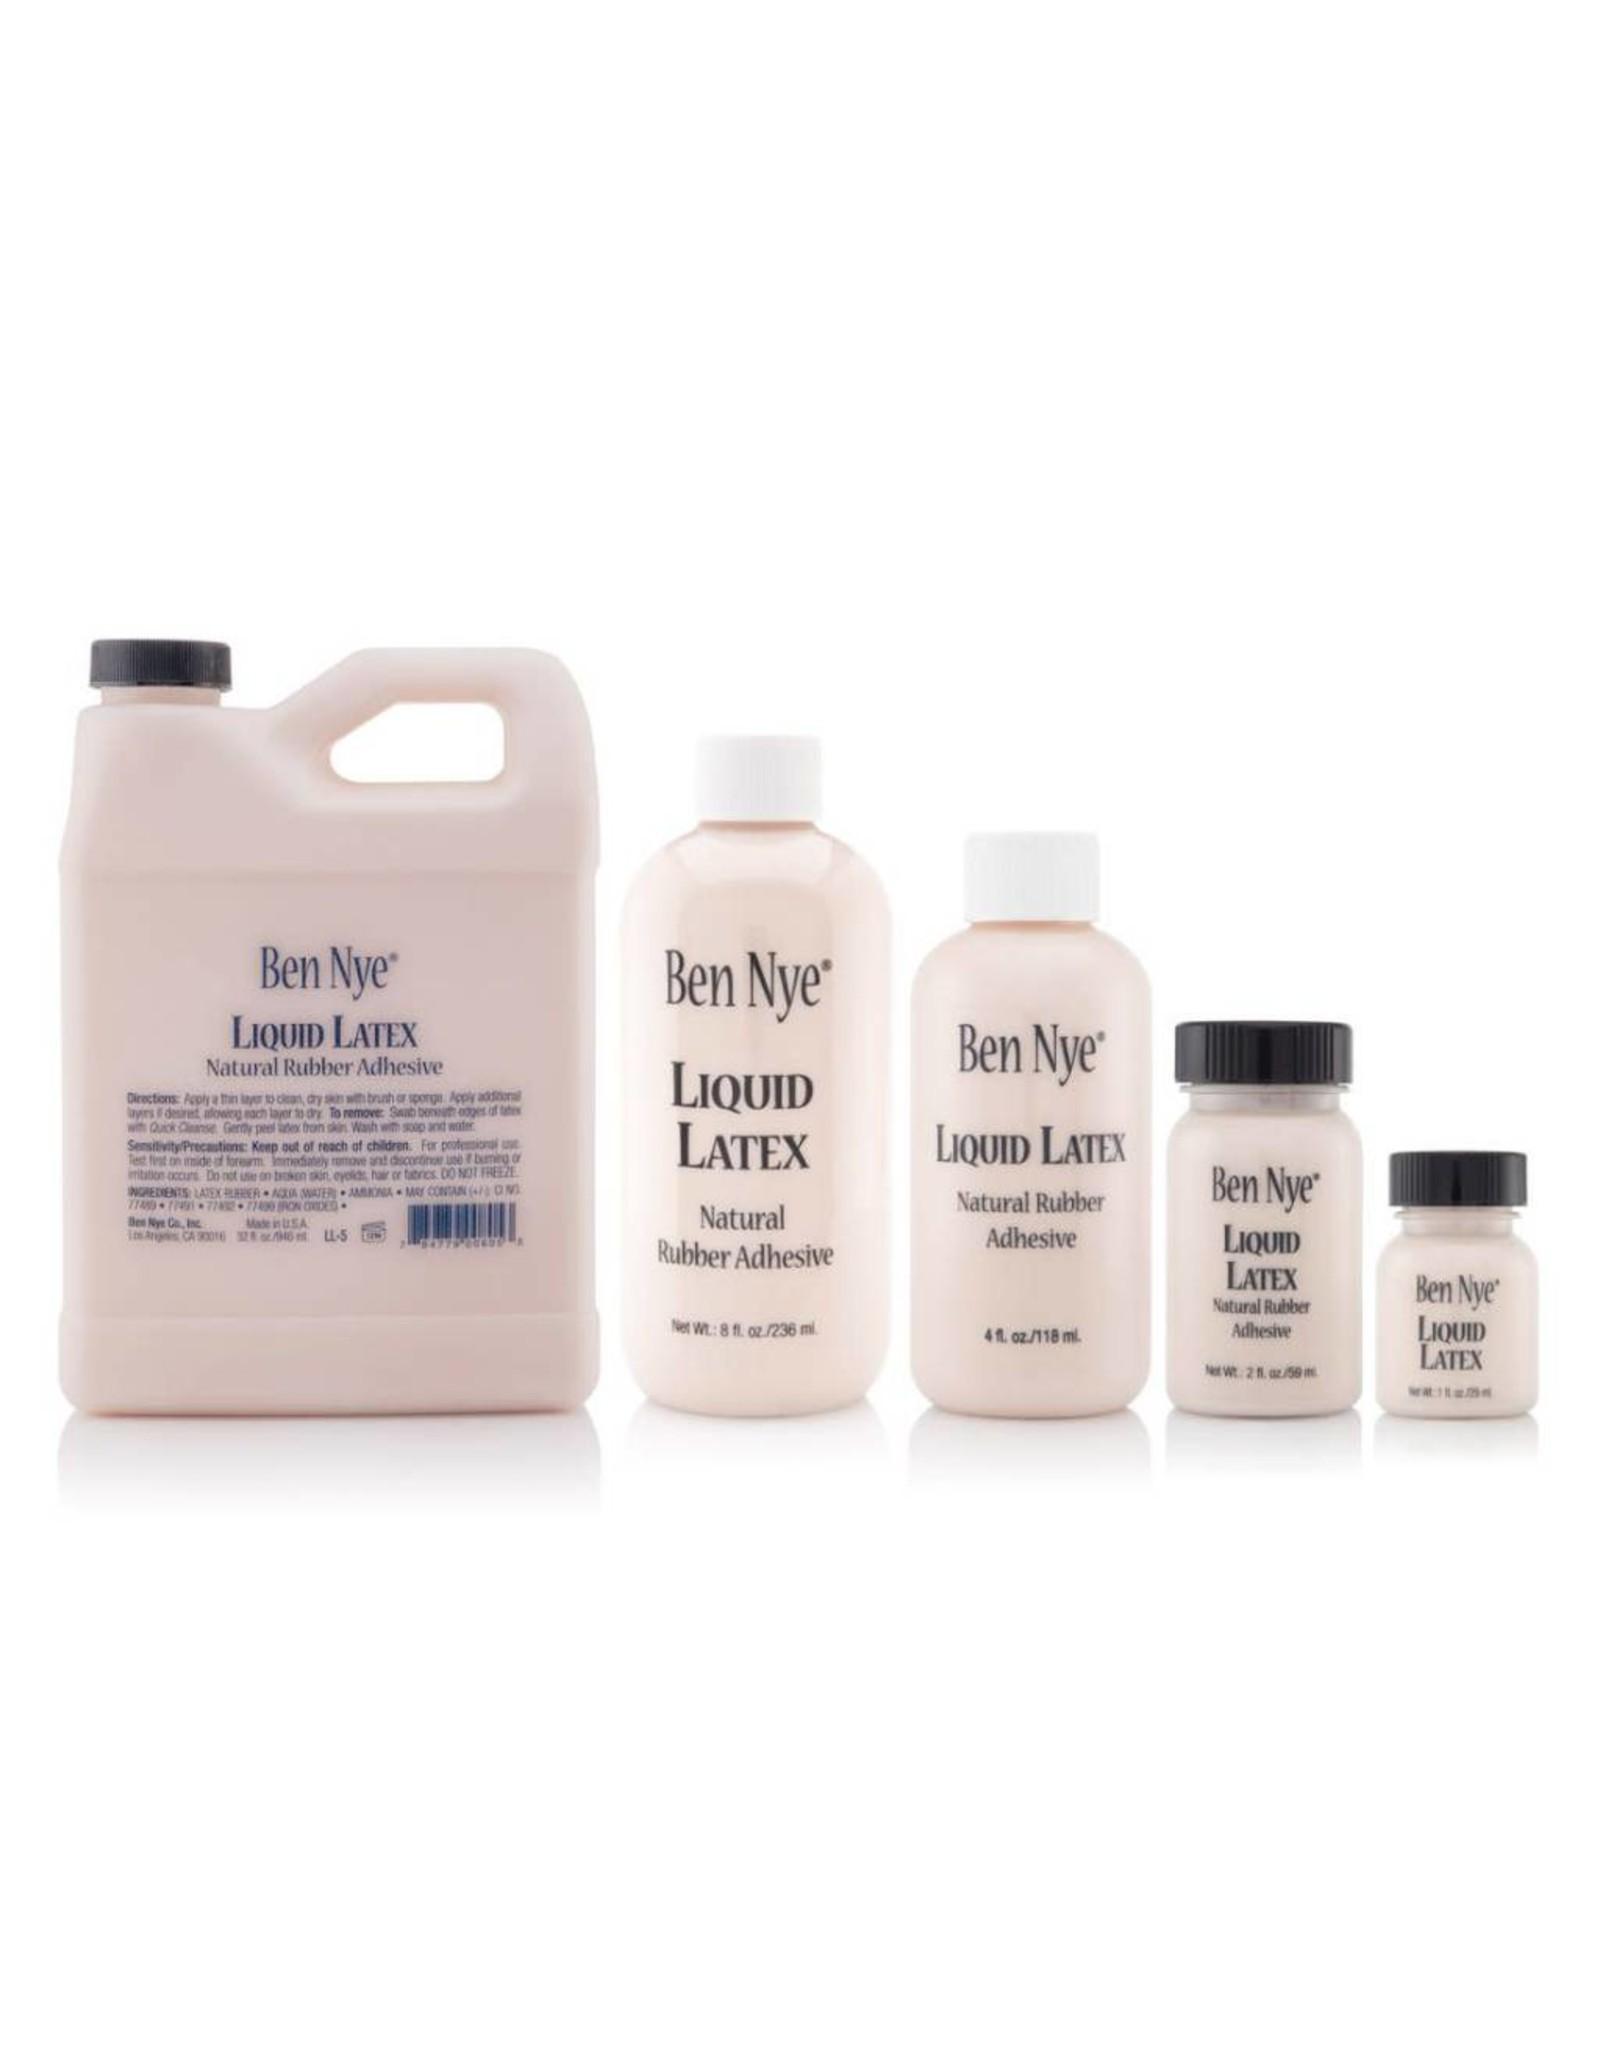 Ben Nye Ben Nye Liquid Latex